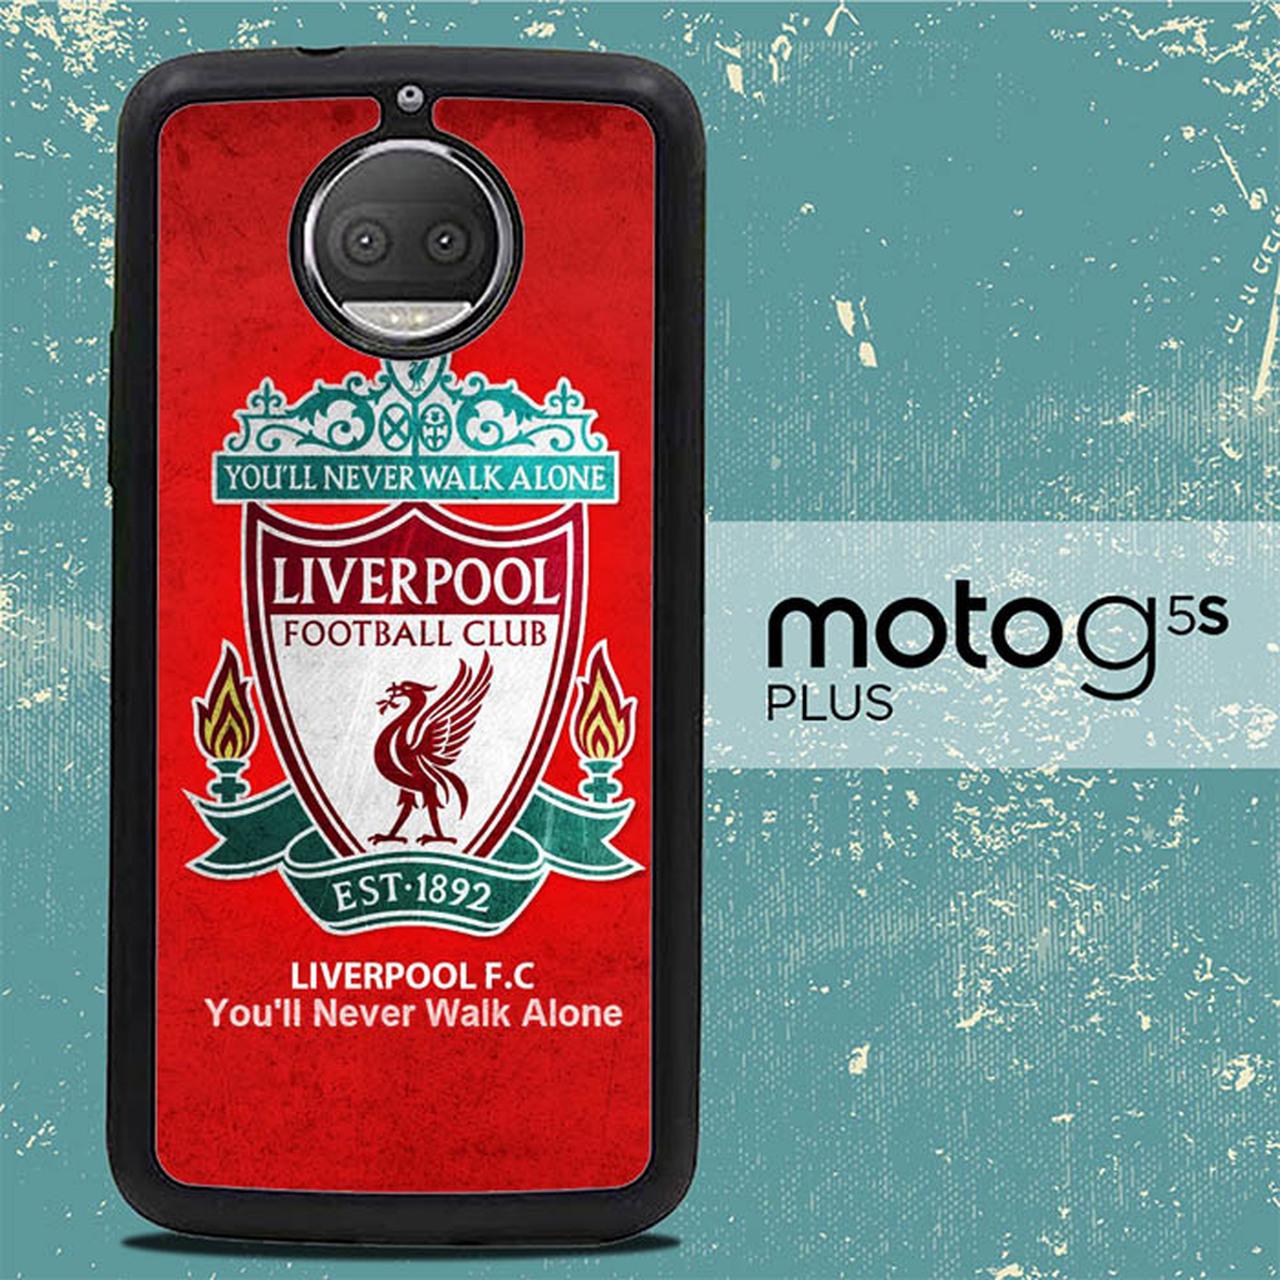 Samsung Note 10 Case Liverpool 1280x1280 Download Hd Wallpaper Wallpapertip